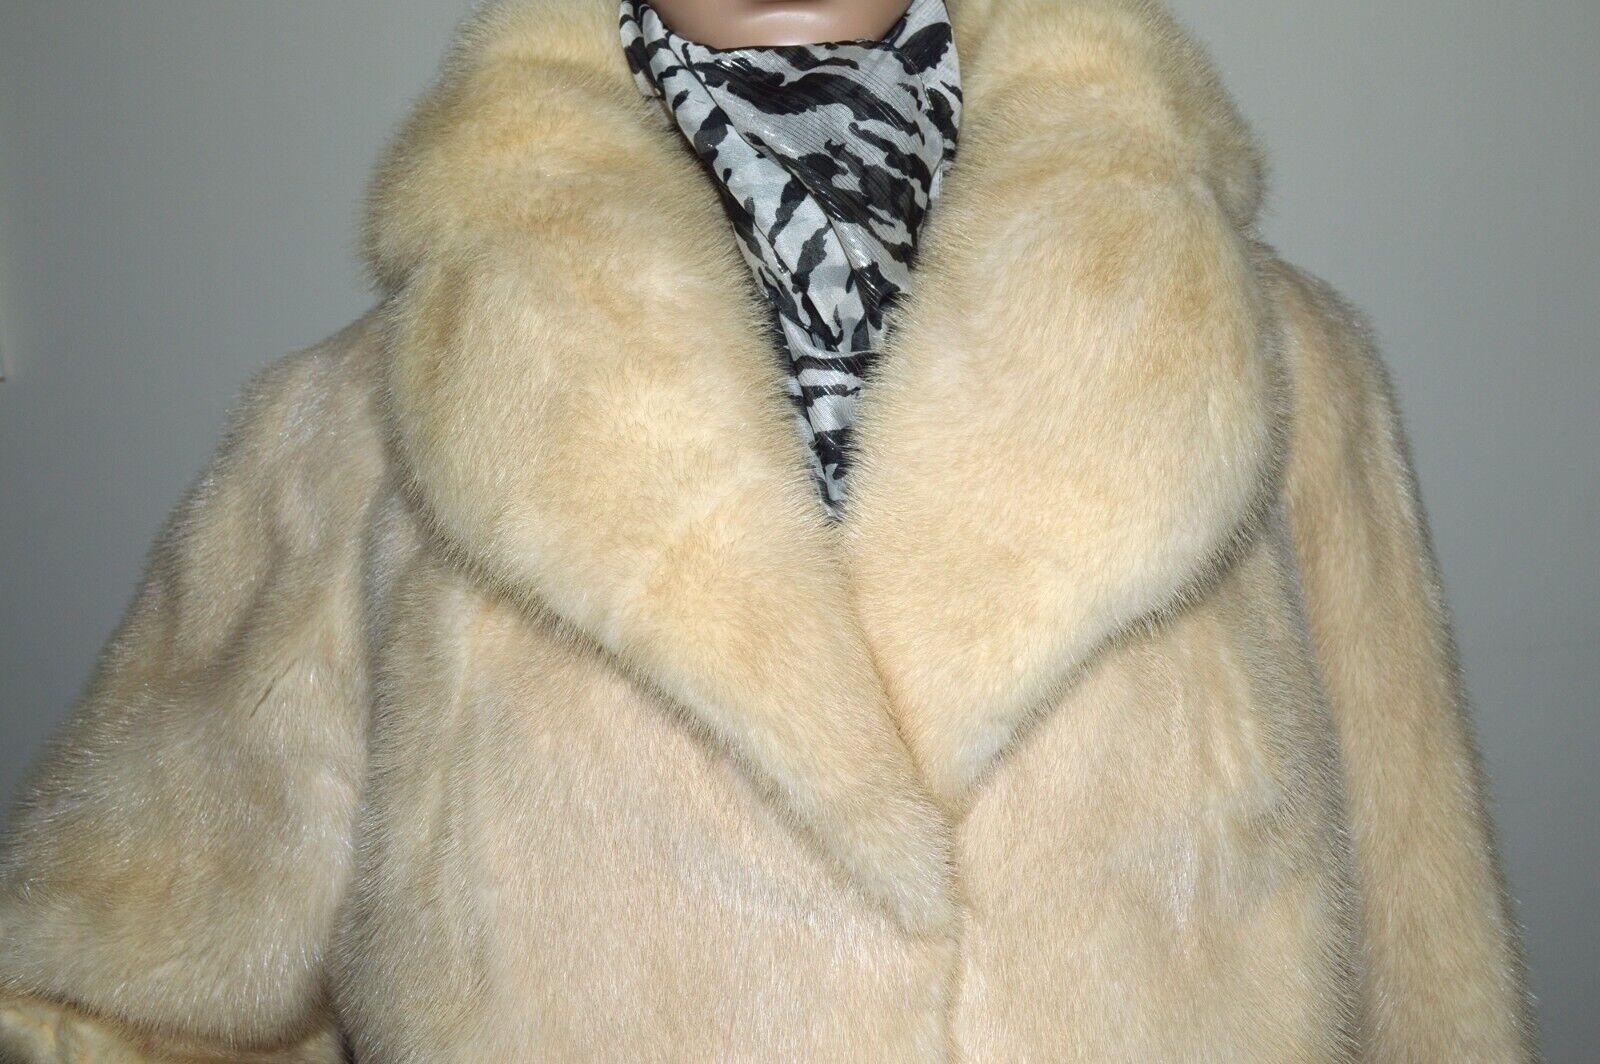 Vintage Women's Bensky Furs Cream Ivory Genuine Mink Coat Coat Coat M L Shawl Collar 550cd8